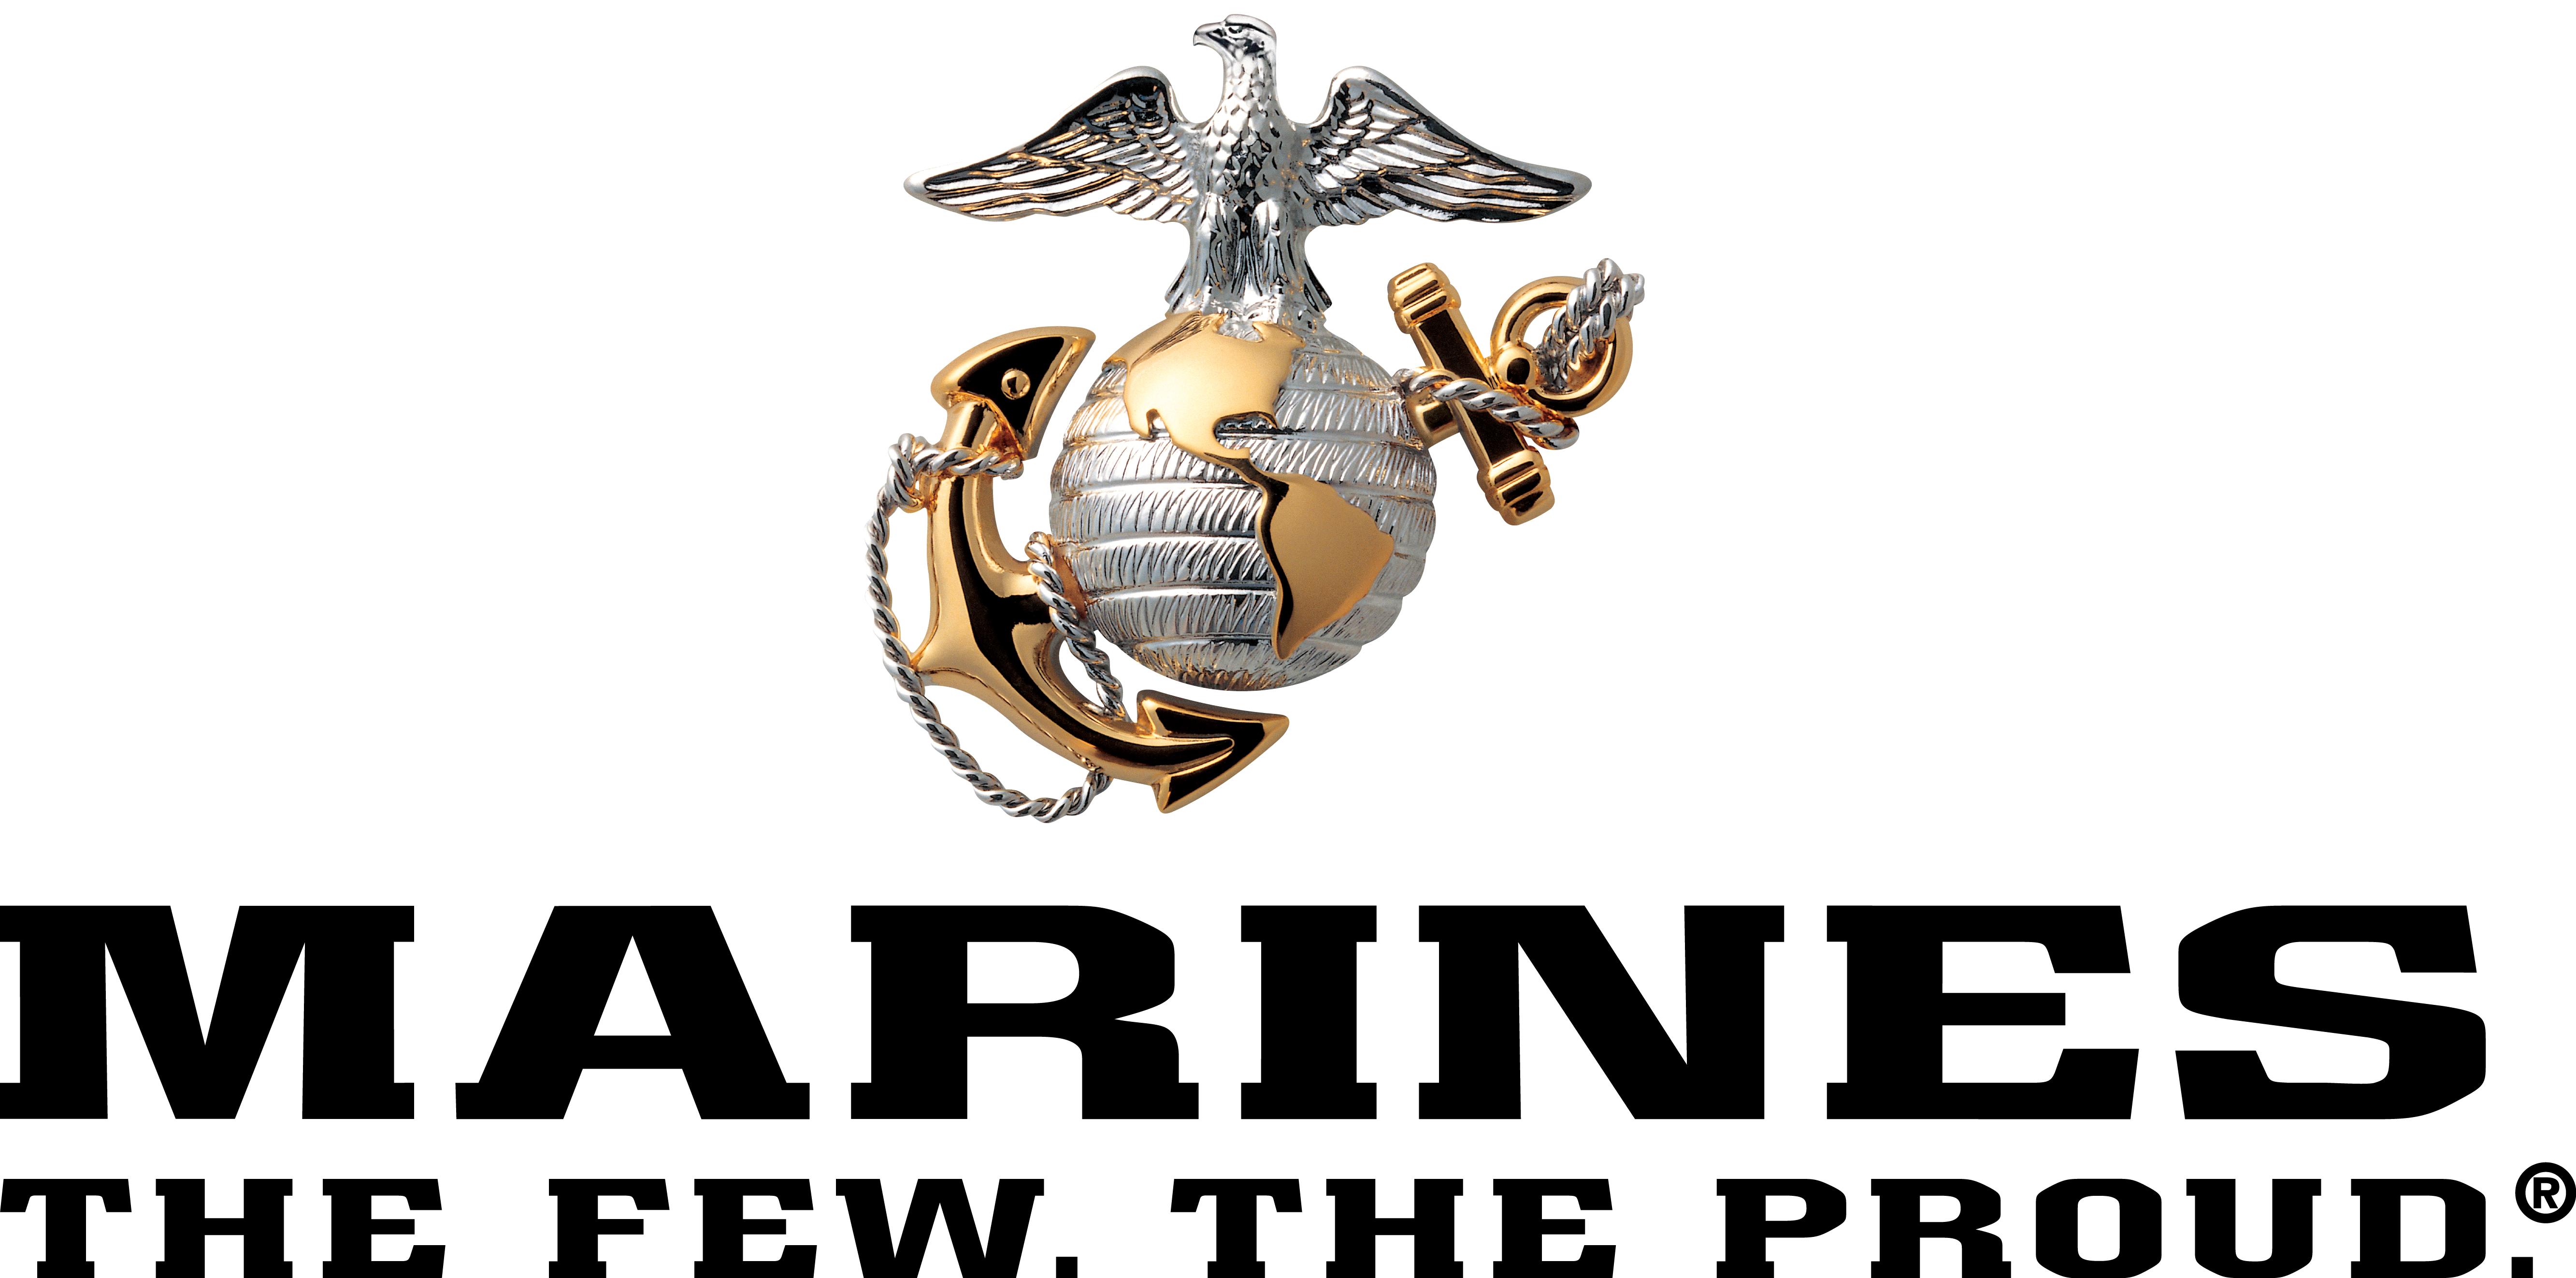 5331x2644 Marine Corps Logos